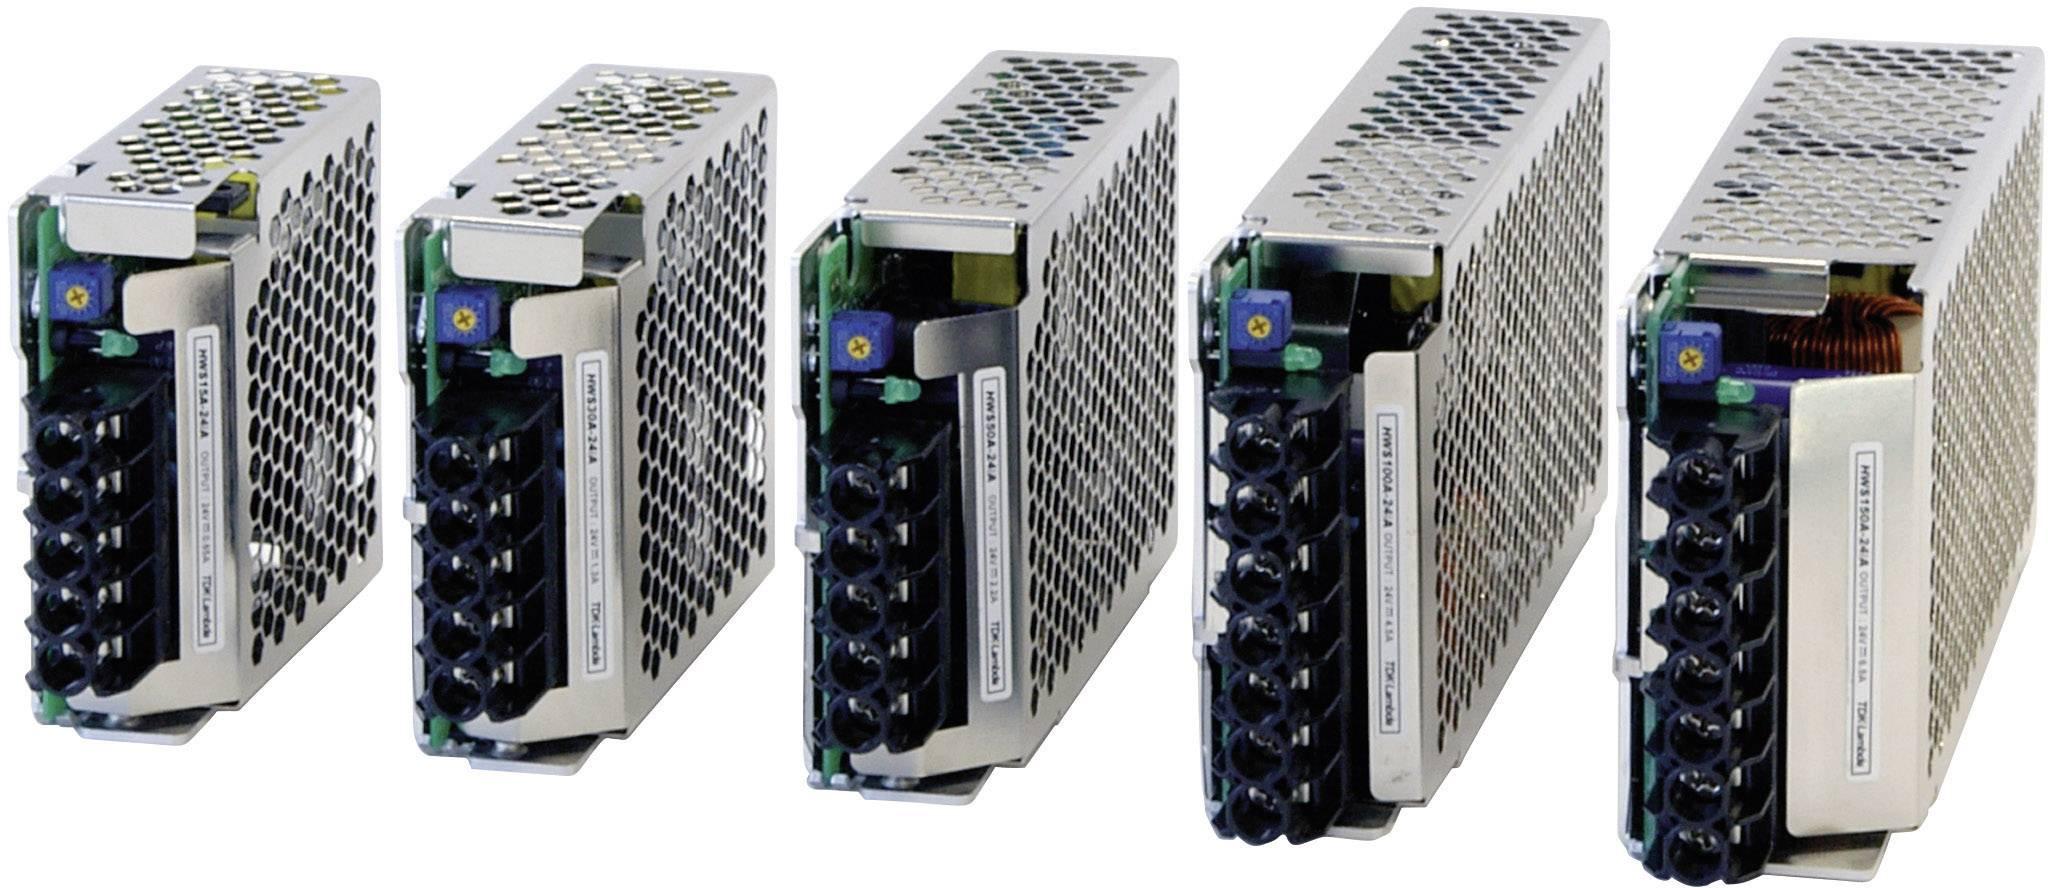 Zabudovateľný napájací zdroj TDK-Lambda HWS-50A-12, 12 V, 51,6 W